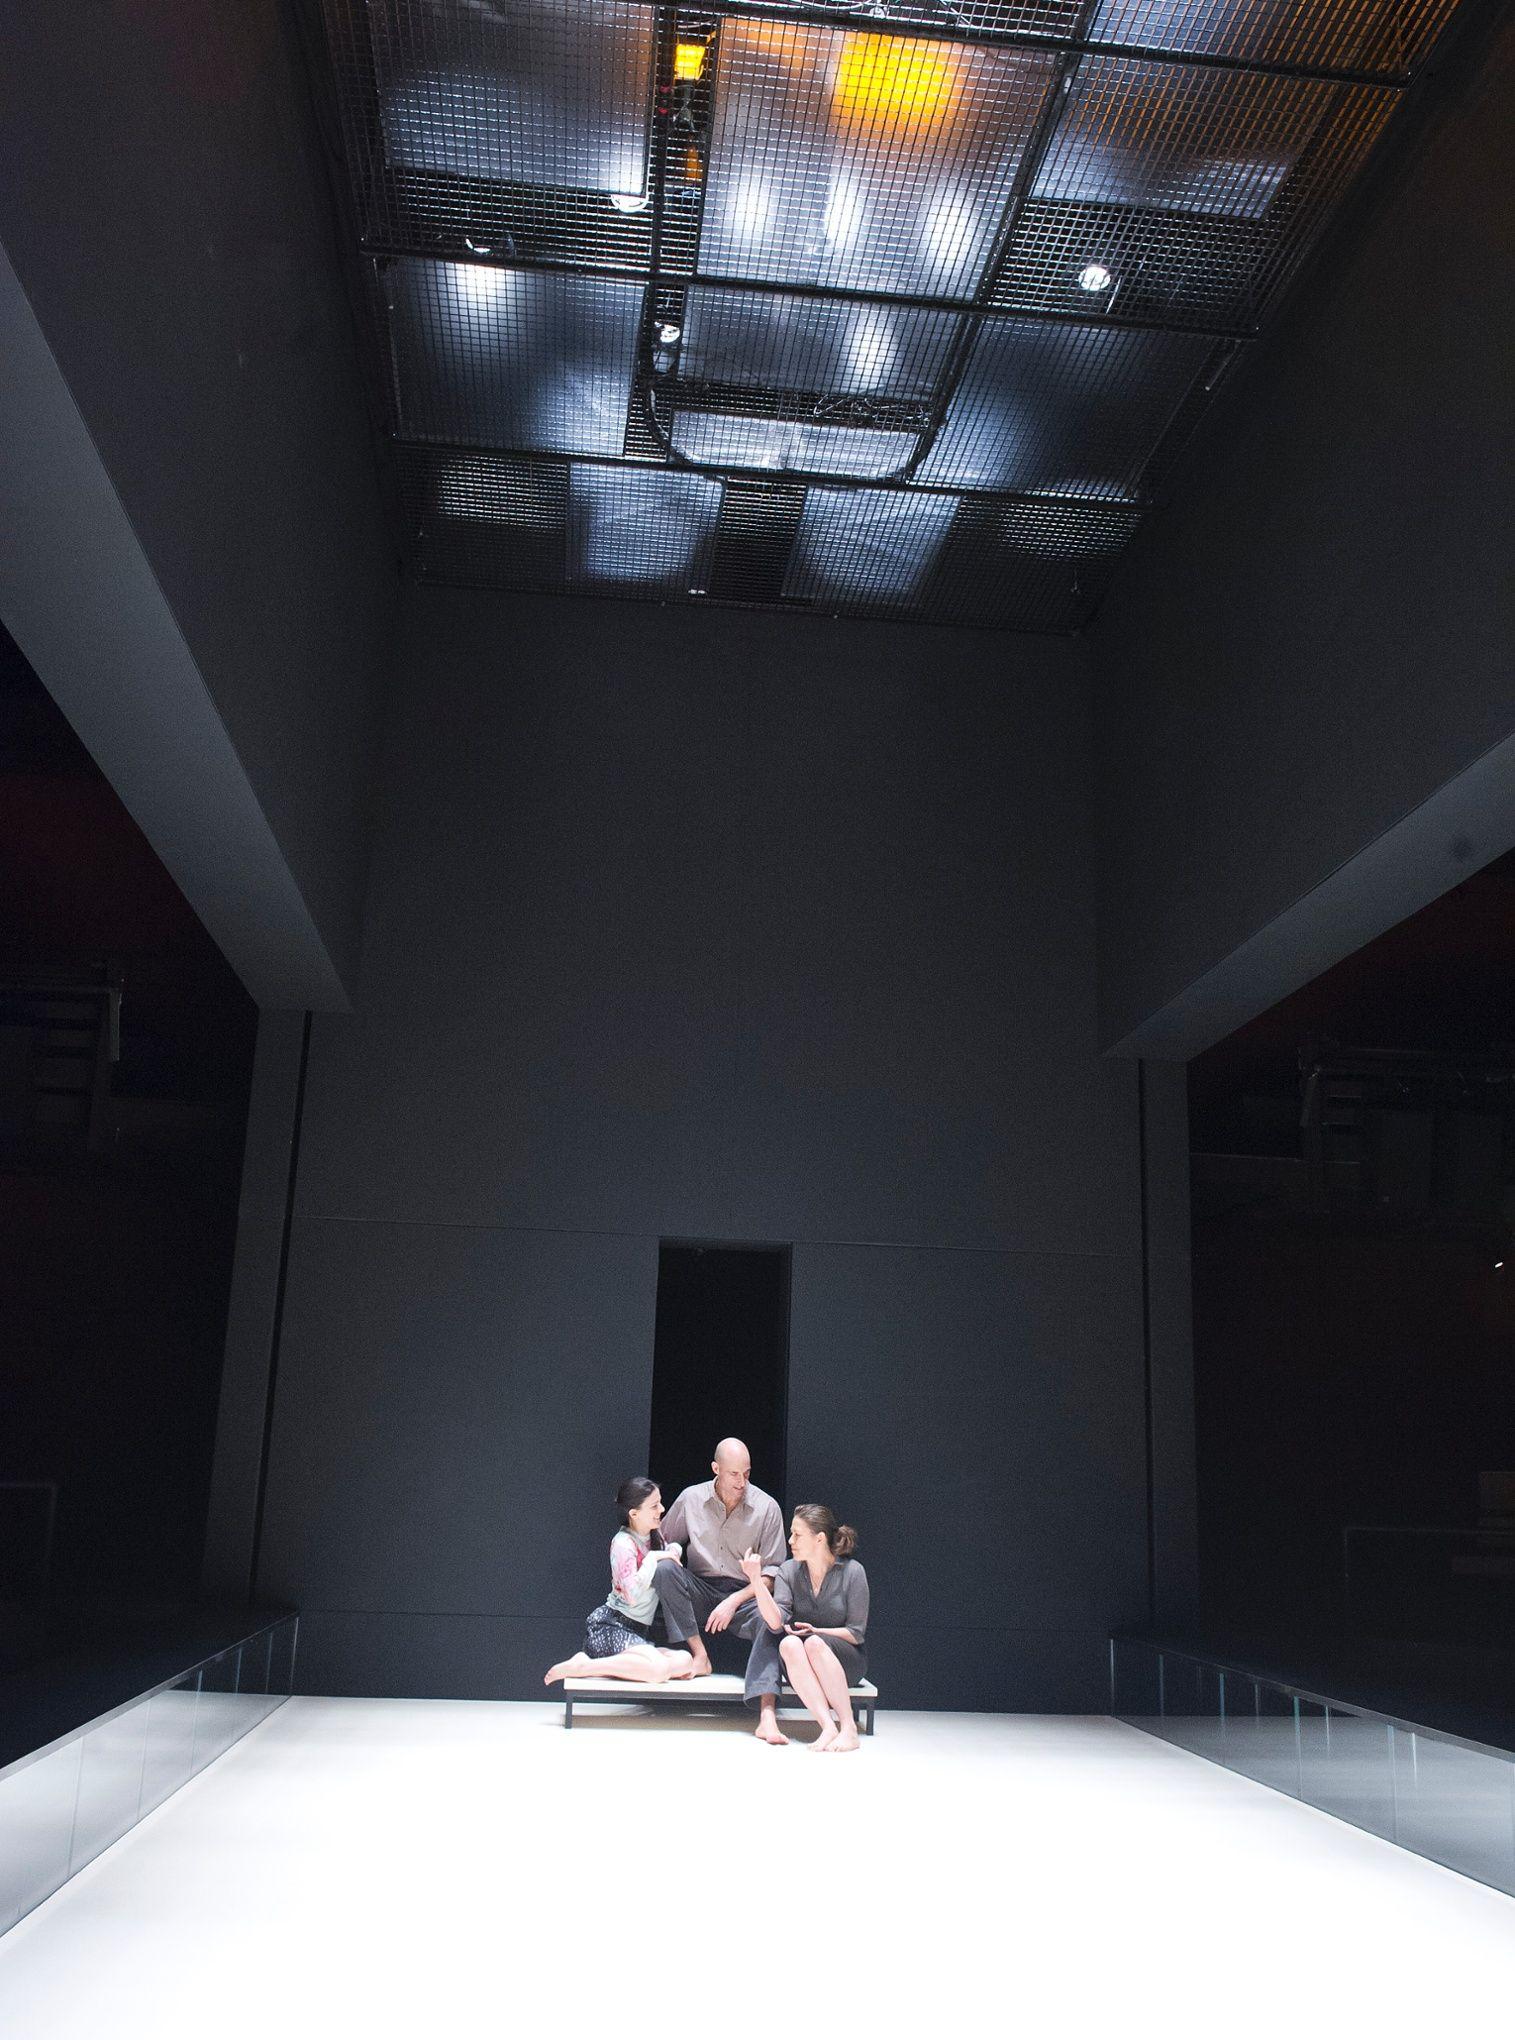 A View From The Bridge Five Star Review Ivo Van Hove Reinvents Arthur Miller Set Design Theatre Ivo Van Hove Scenic Design Theatres